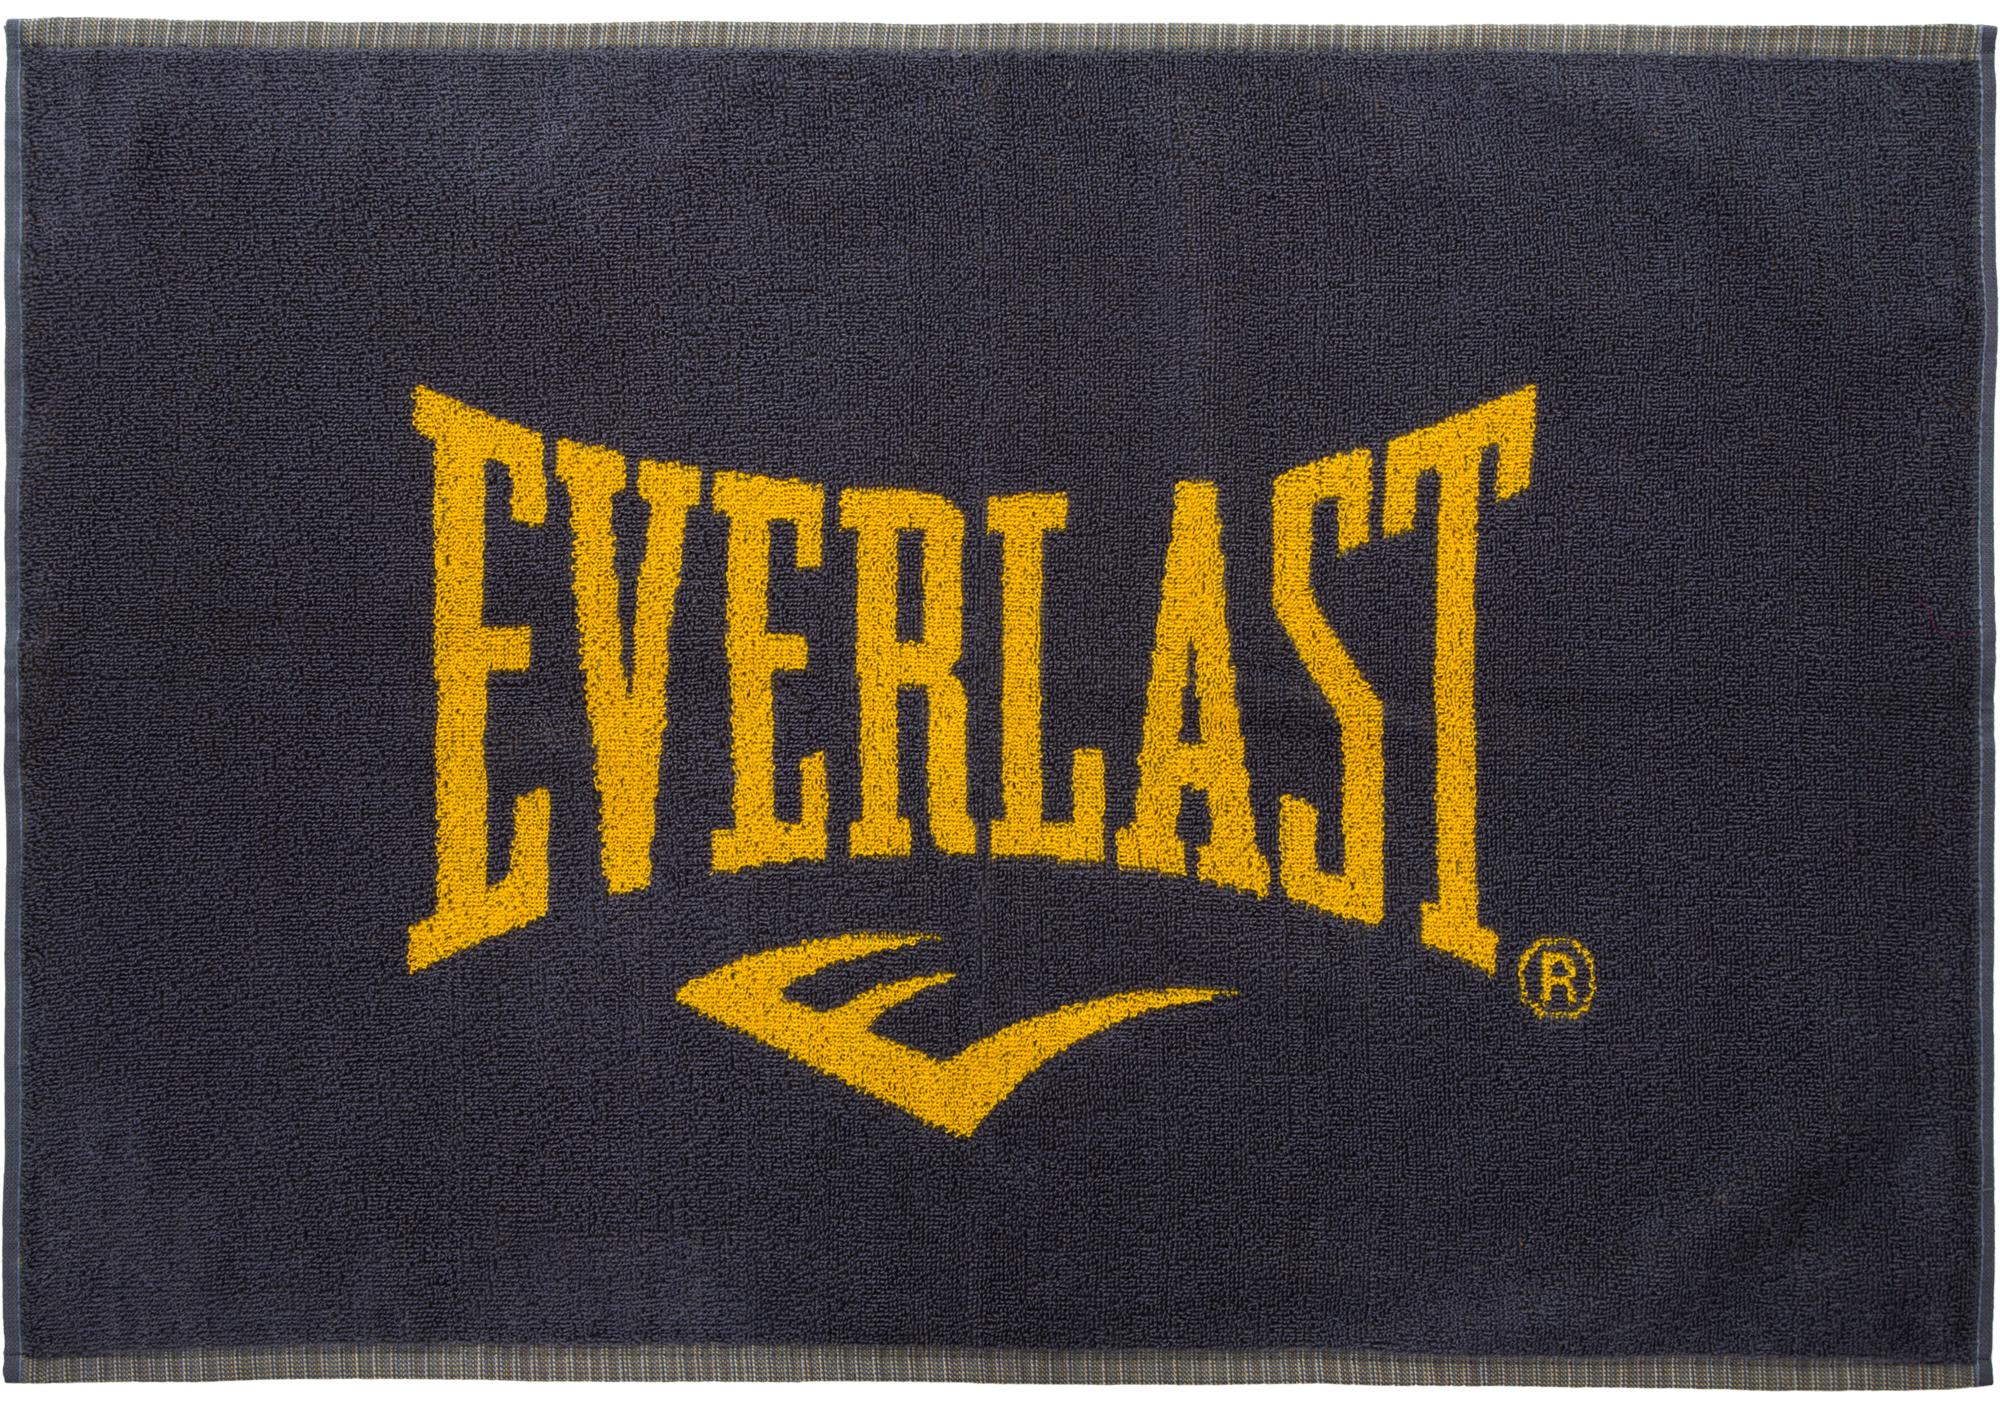 цена на Everlast Полотенце махровое Everlast, 70 х 50 см